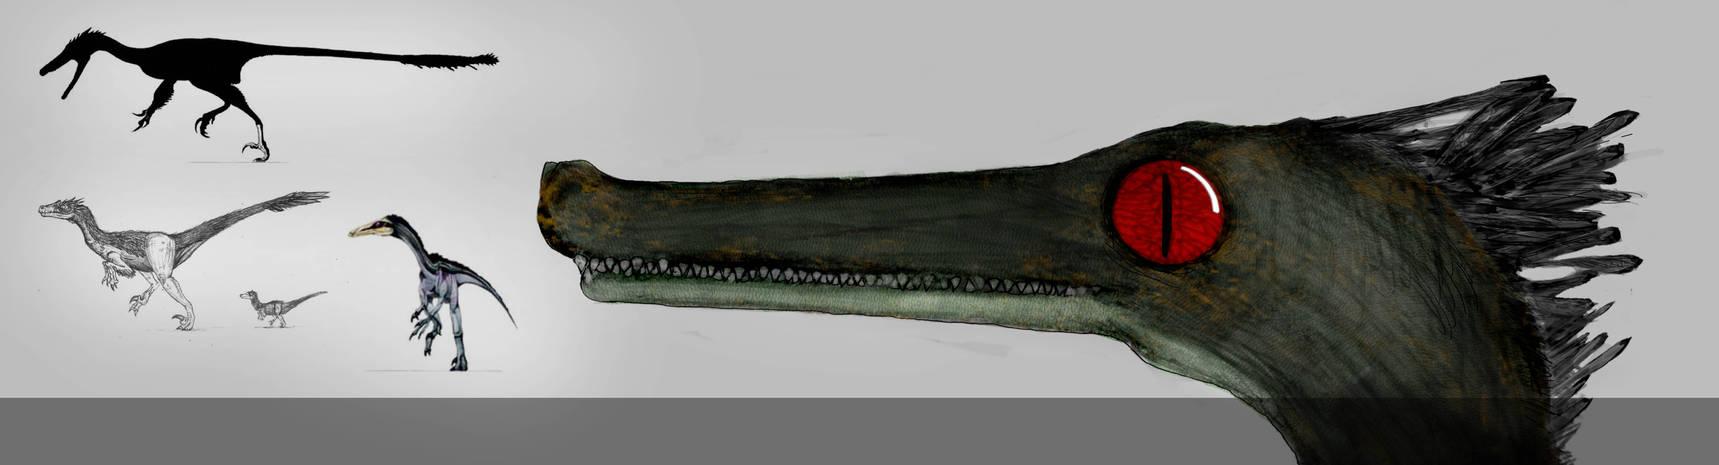 Neuquenraptor concept by ArTomsey